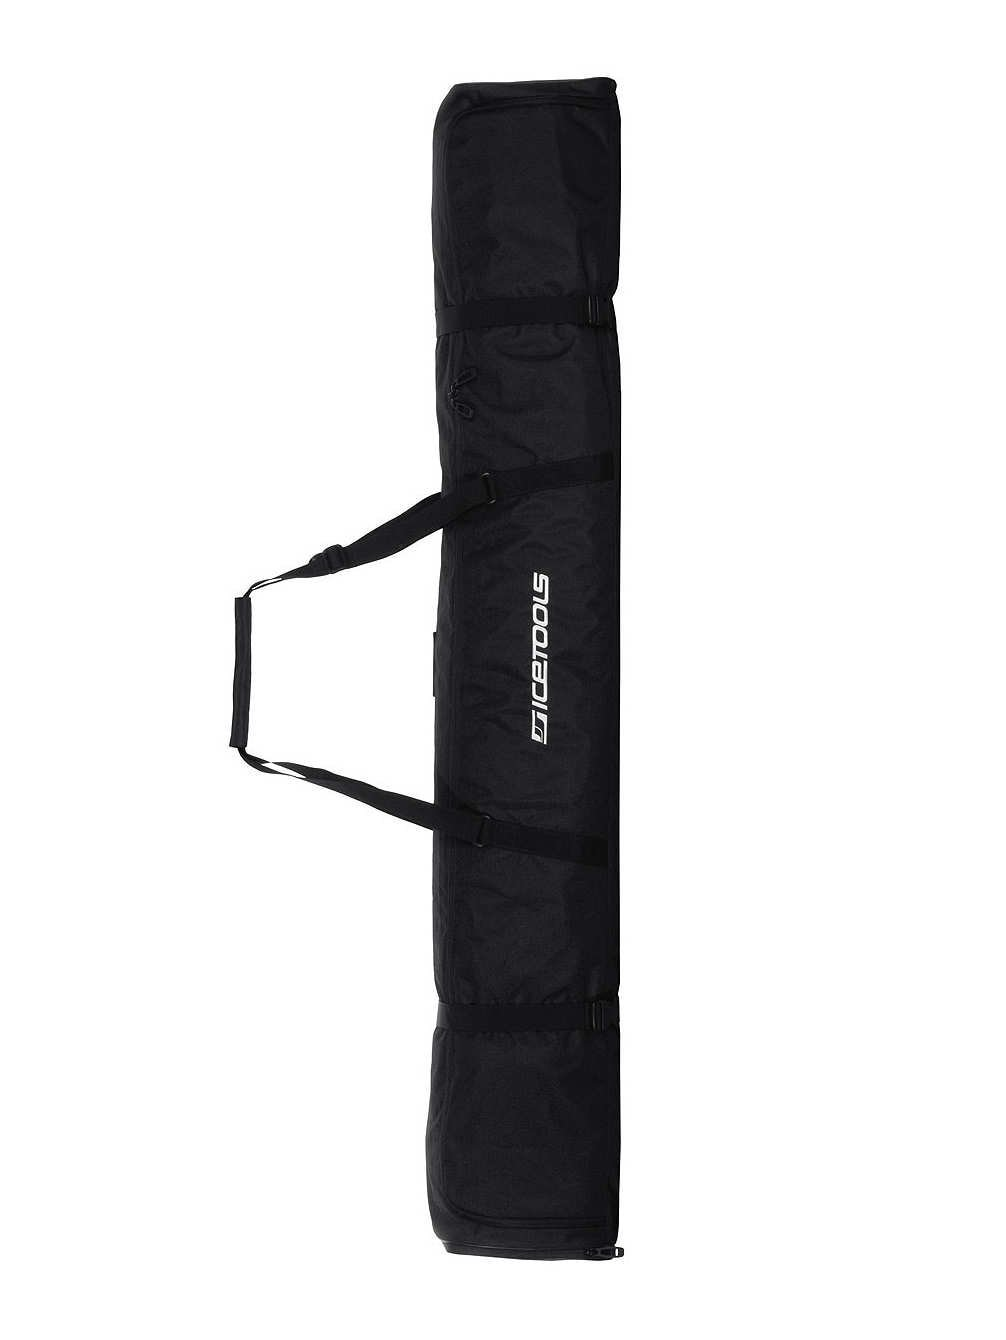 Icetools Ski Tasche Ski Bag Pro 180-190